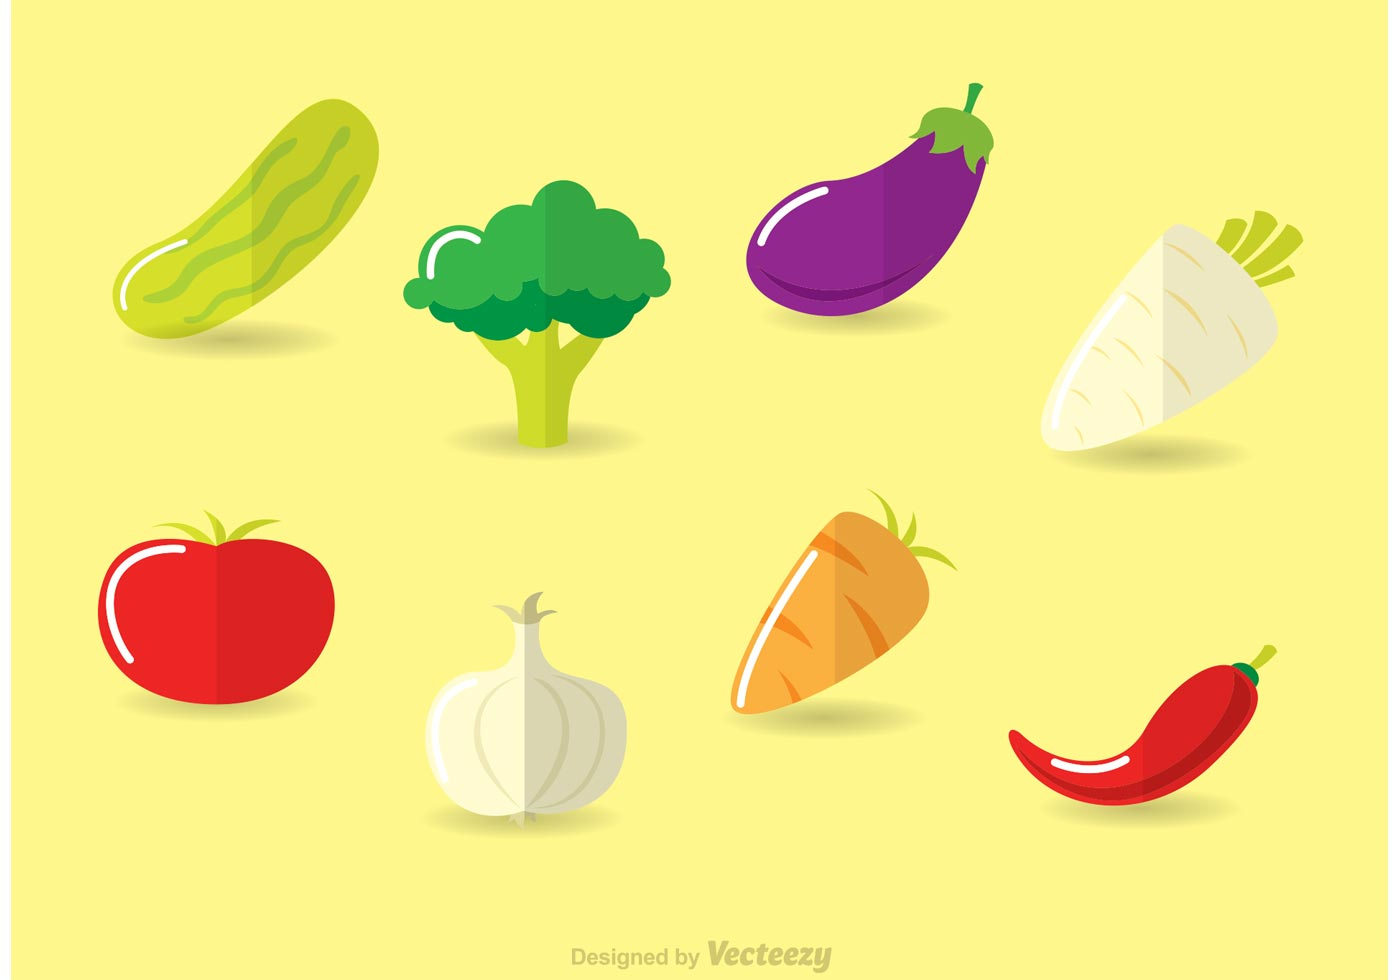 Flat Vegetable Vectors Icons - Download Free Vector Art ...